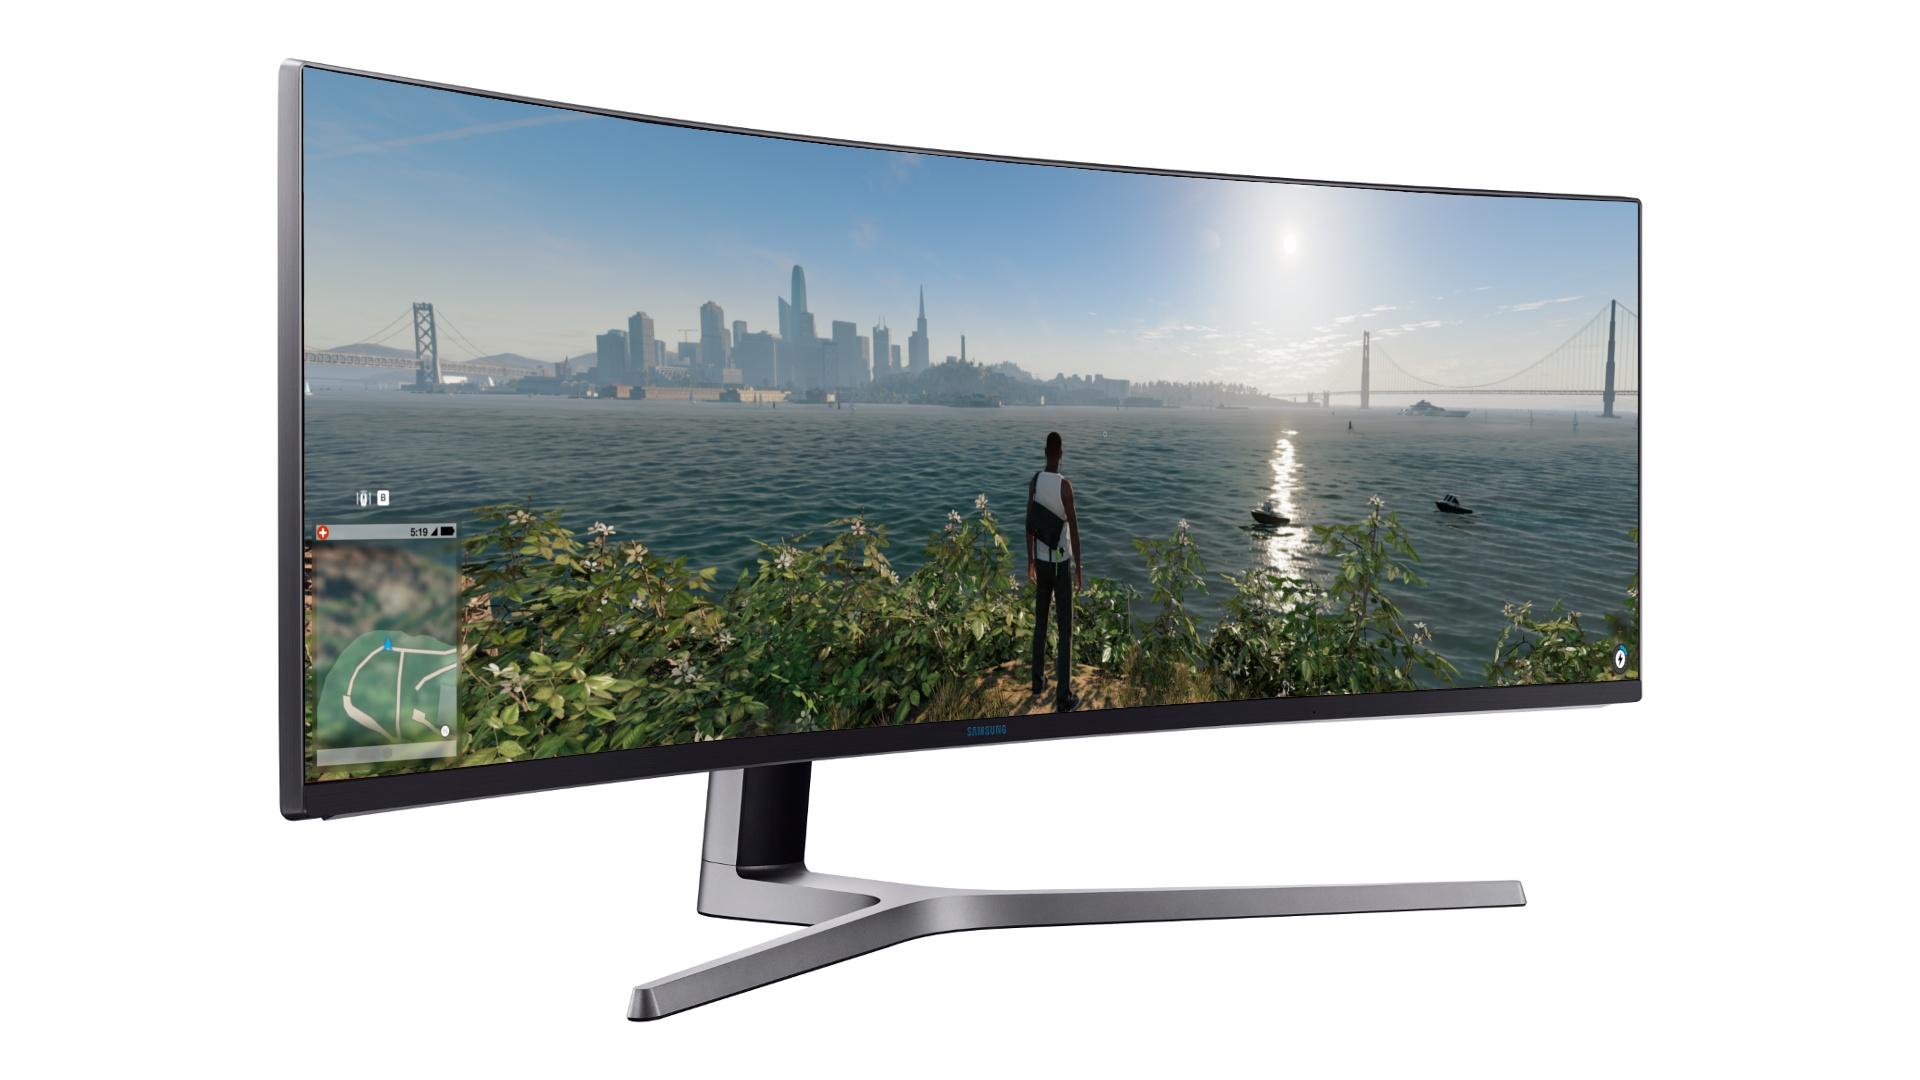 samsung chg90 super ultra wide monitor auf 49 zoll mit hdr gamestar. Black Bedroom Furniture Sets. Home Design Ideas